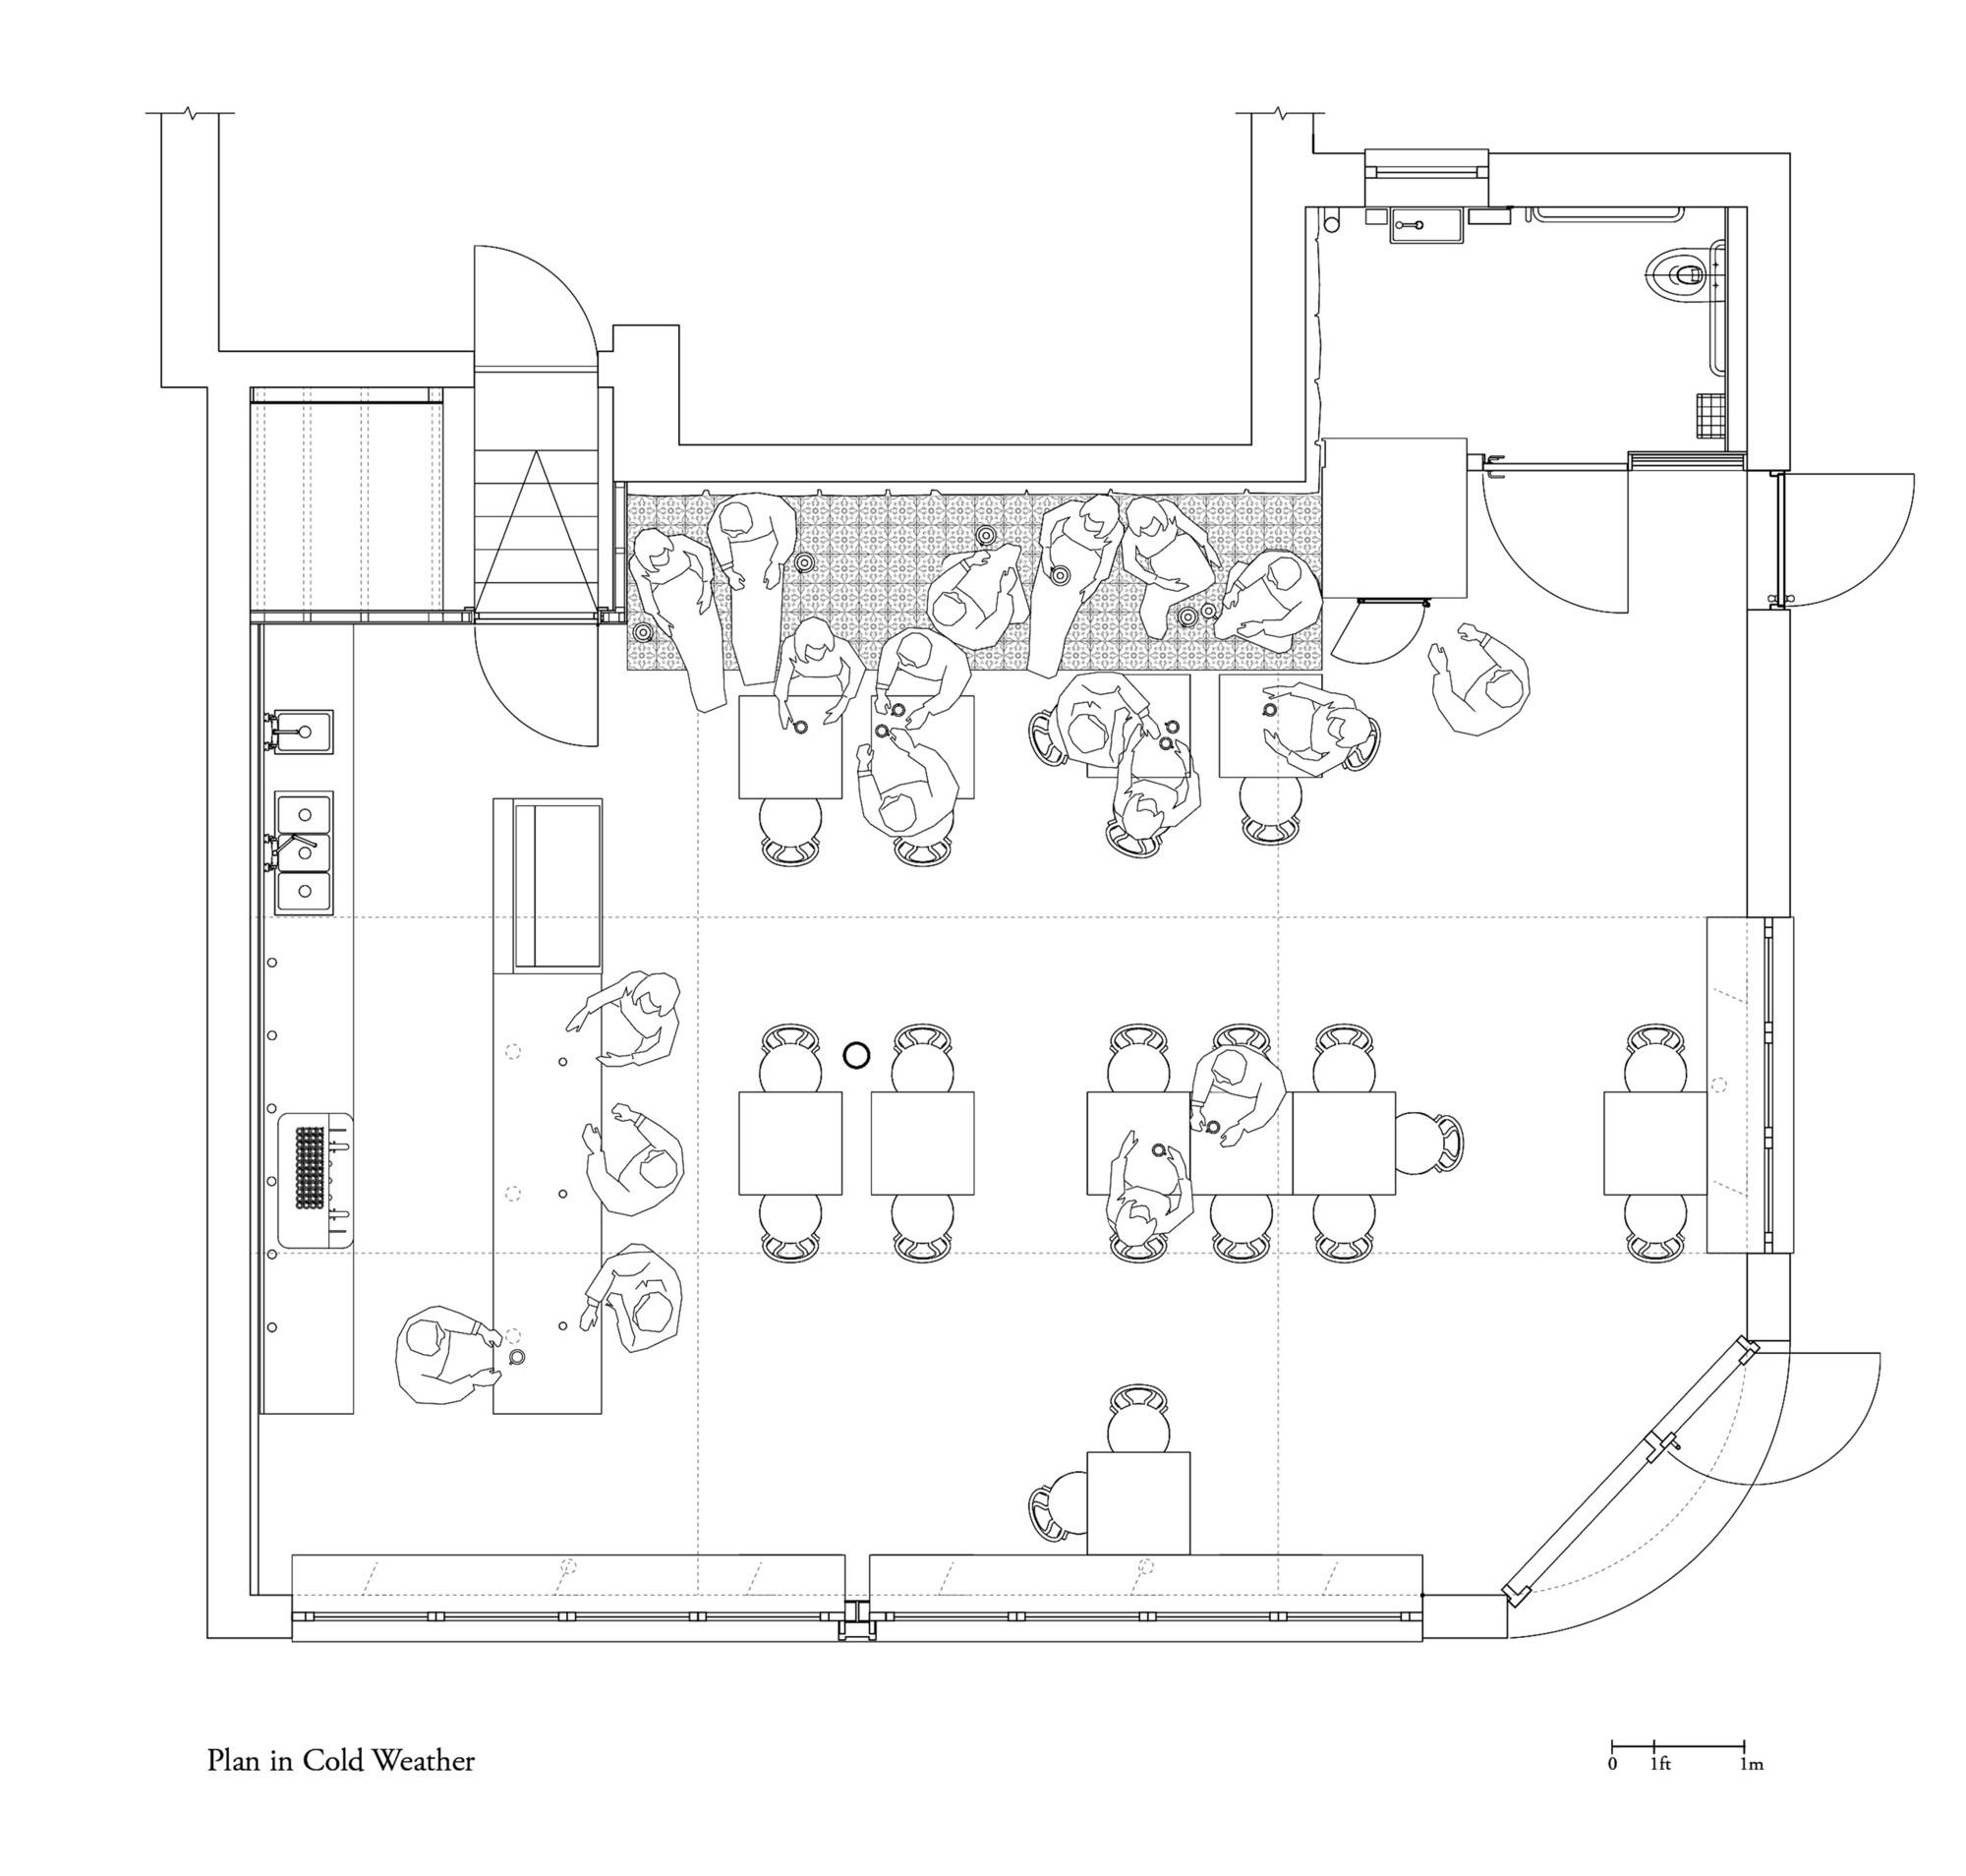 Cafe fargo davidson rafailidis archdaily for Cafe floor plan design